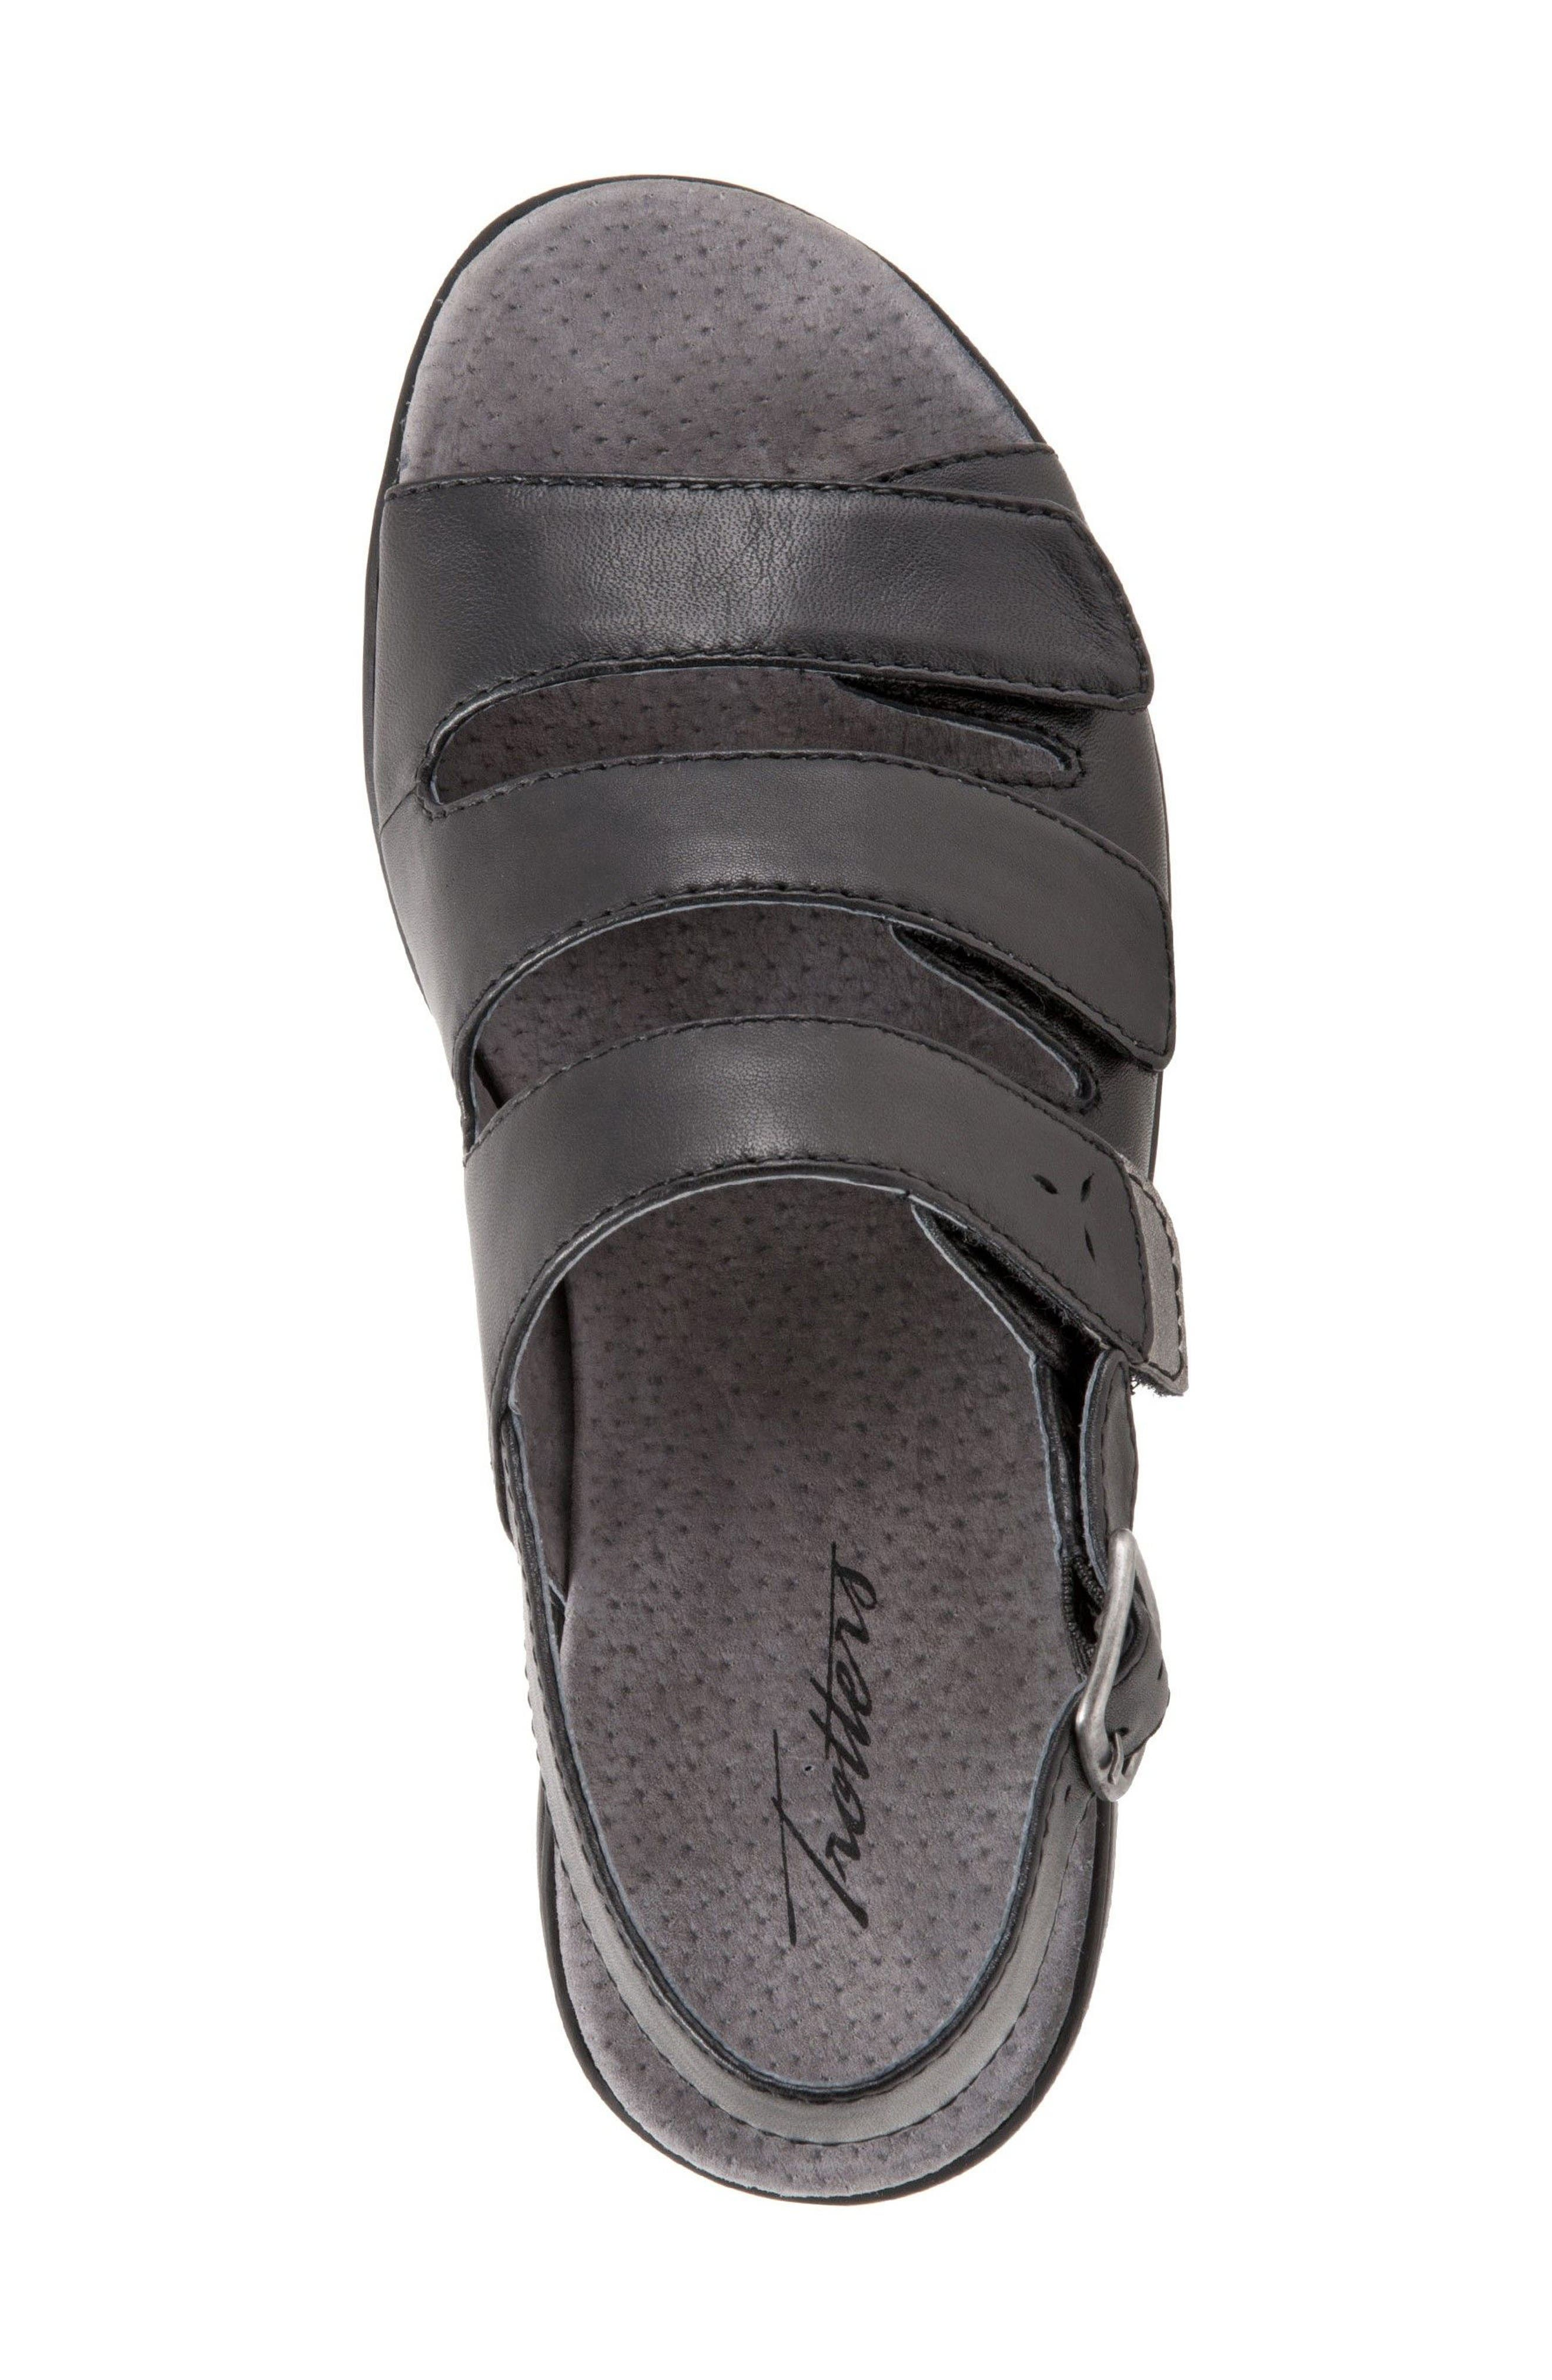 Alternate Image 3  - Trotters Kendra Strappy Slingback Sandal (Women)